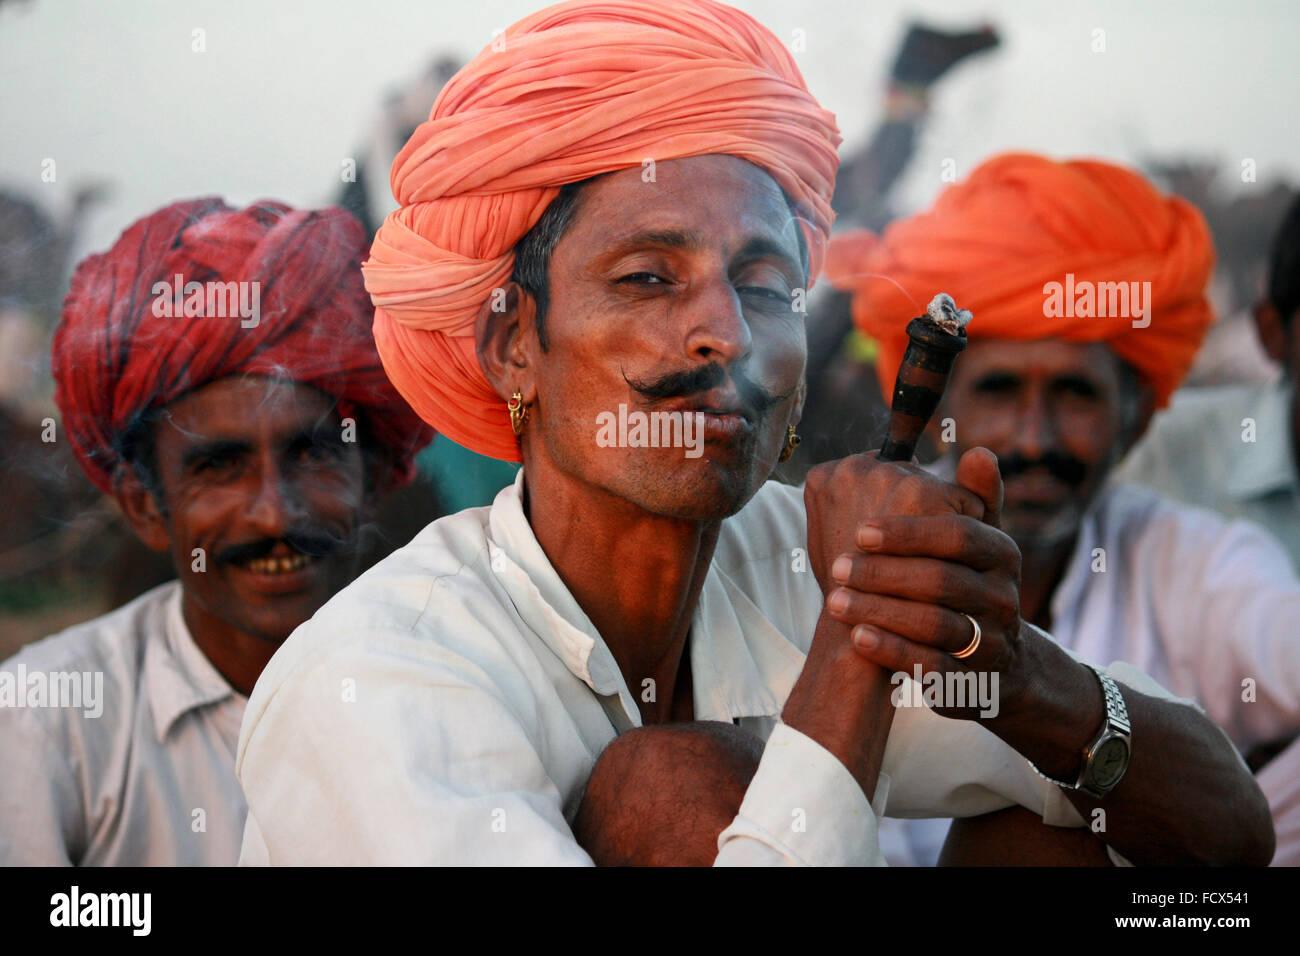 Rajasthani driver cammello chillum fumatori, con turban arancione , in Pushkar, rajasthan Immagini Stock